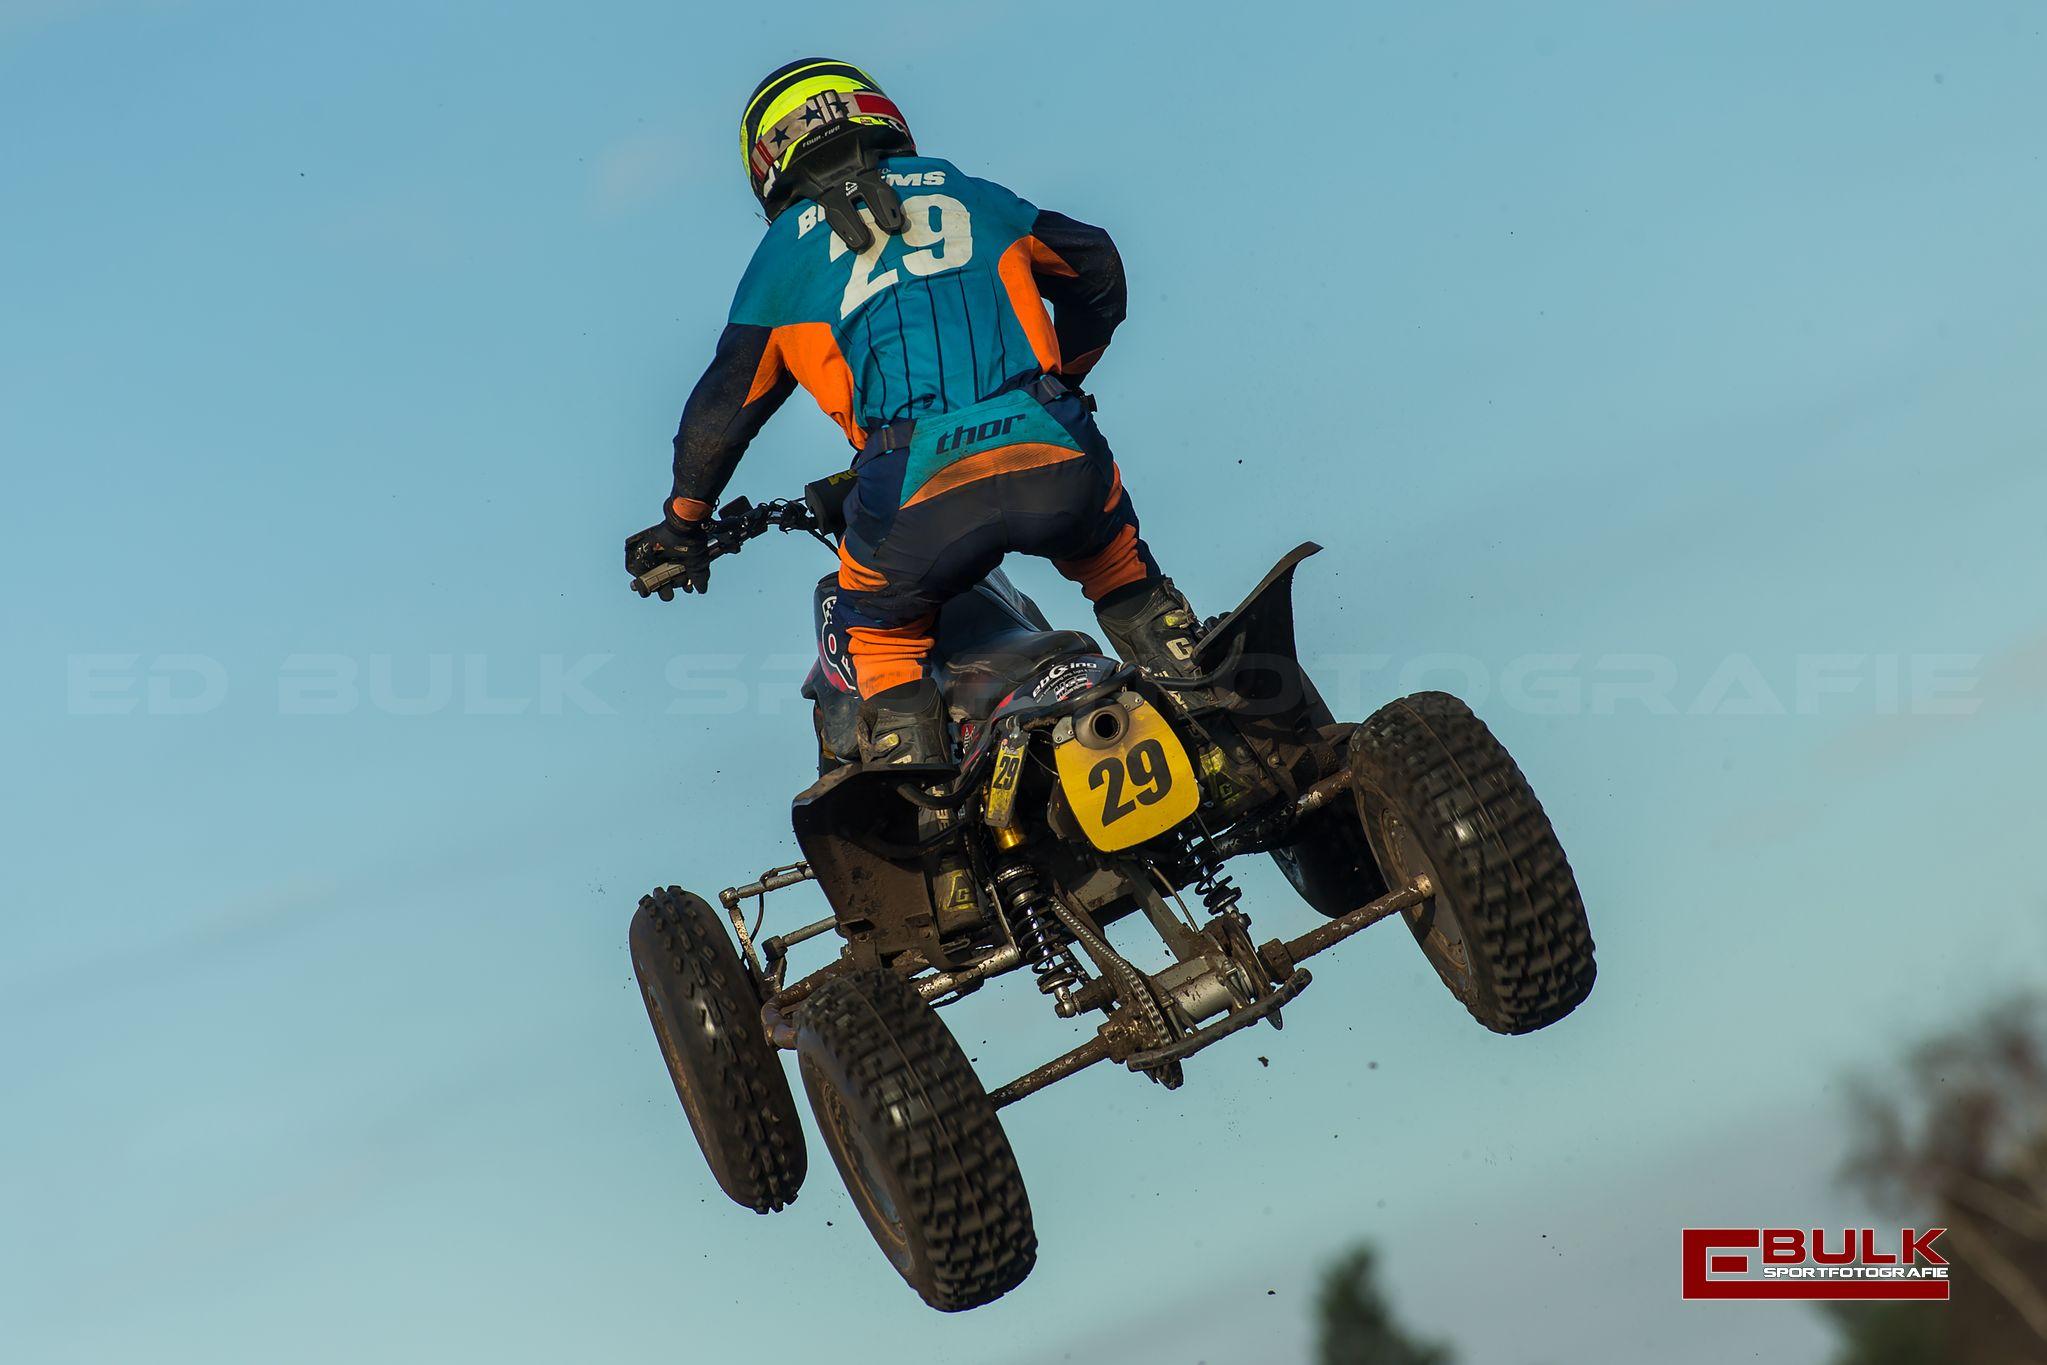 eebs1552-ed_bulk_sportfotografie